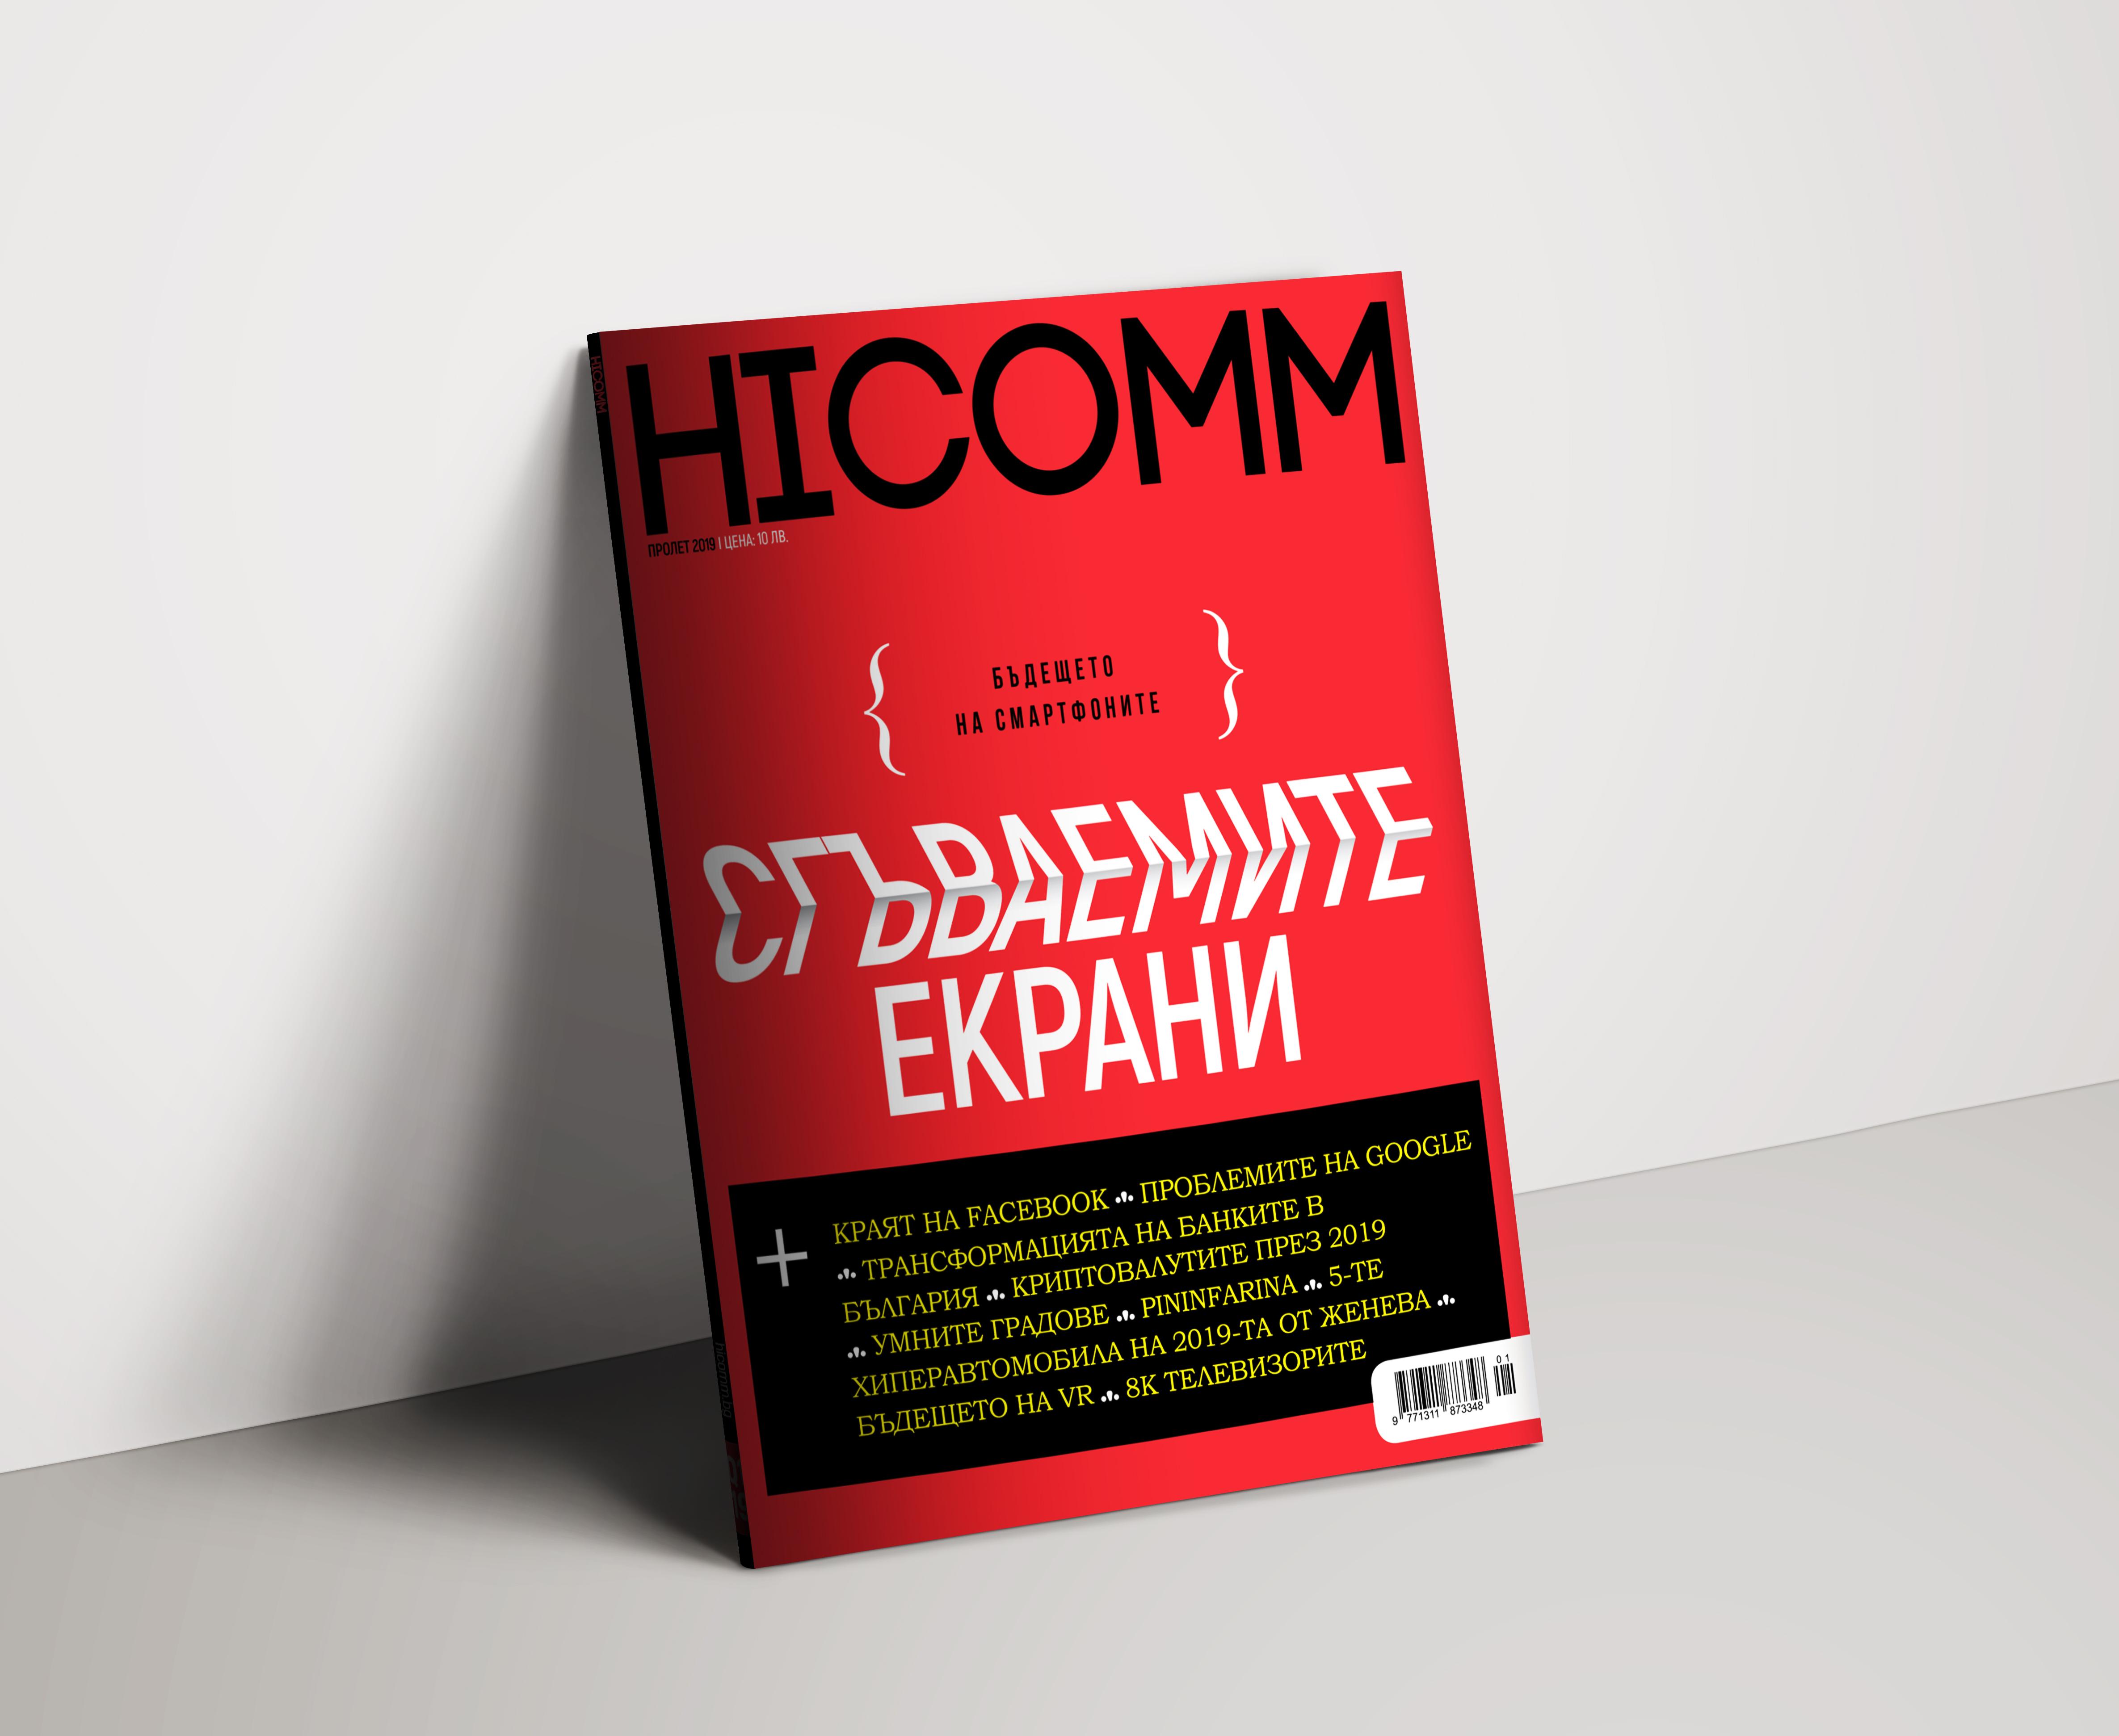 HiComm Пролет 2019: Списание за нови технологии и комуникации